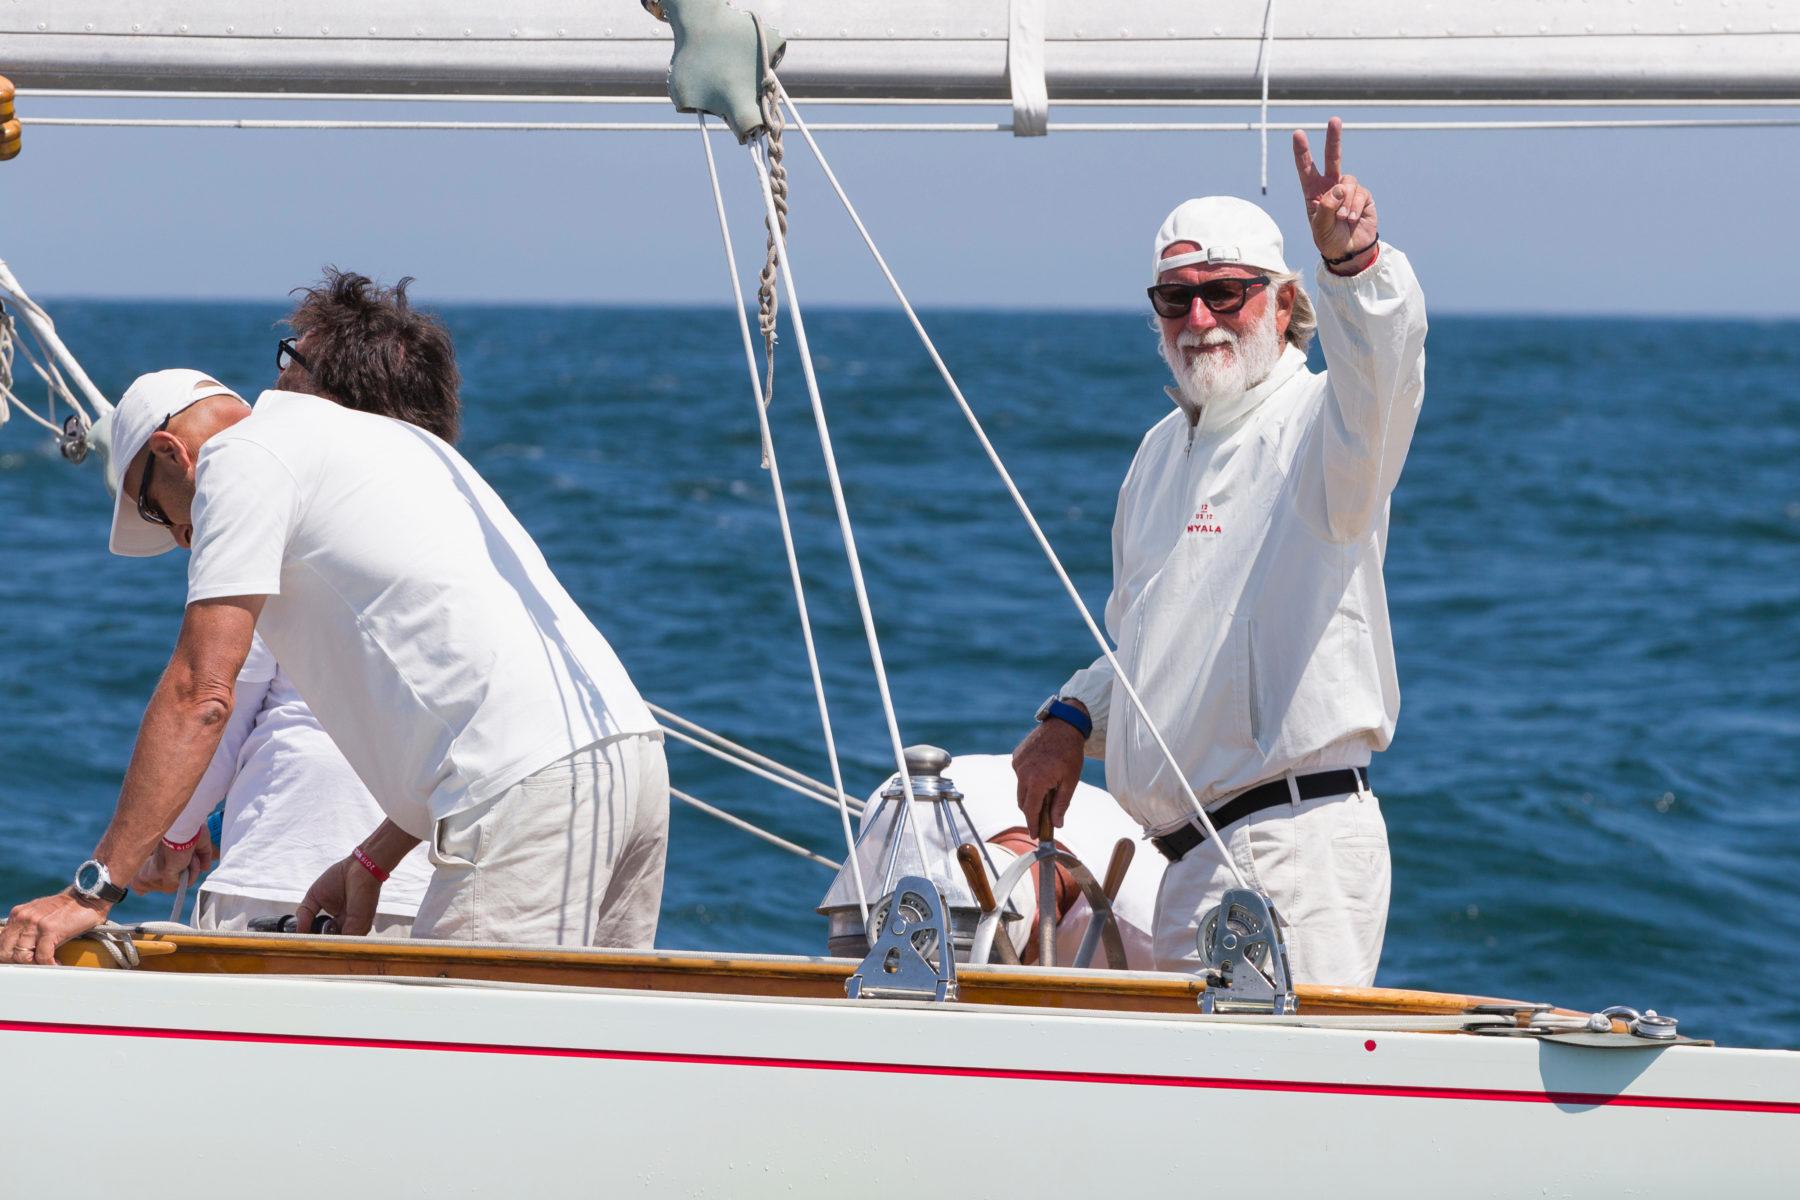 Mauro Pelaschier victorious at 12 m World Championship in Newport R.I. - NEWS - Yacht Club Costa Smeralda